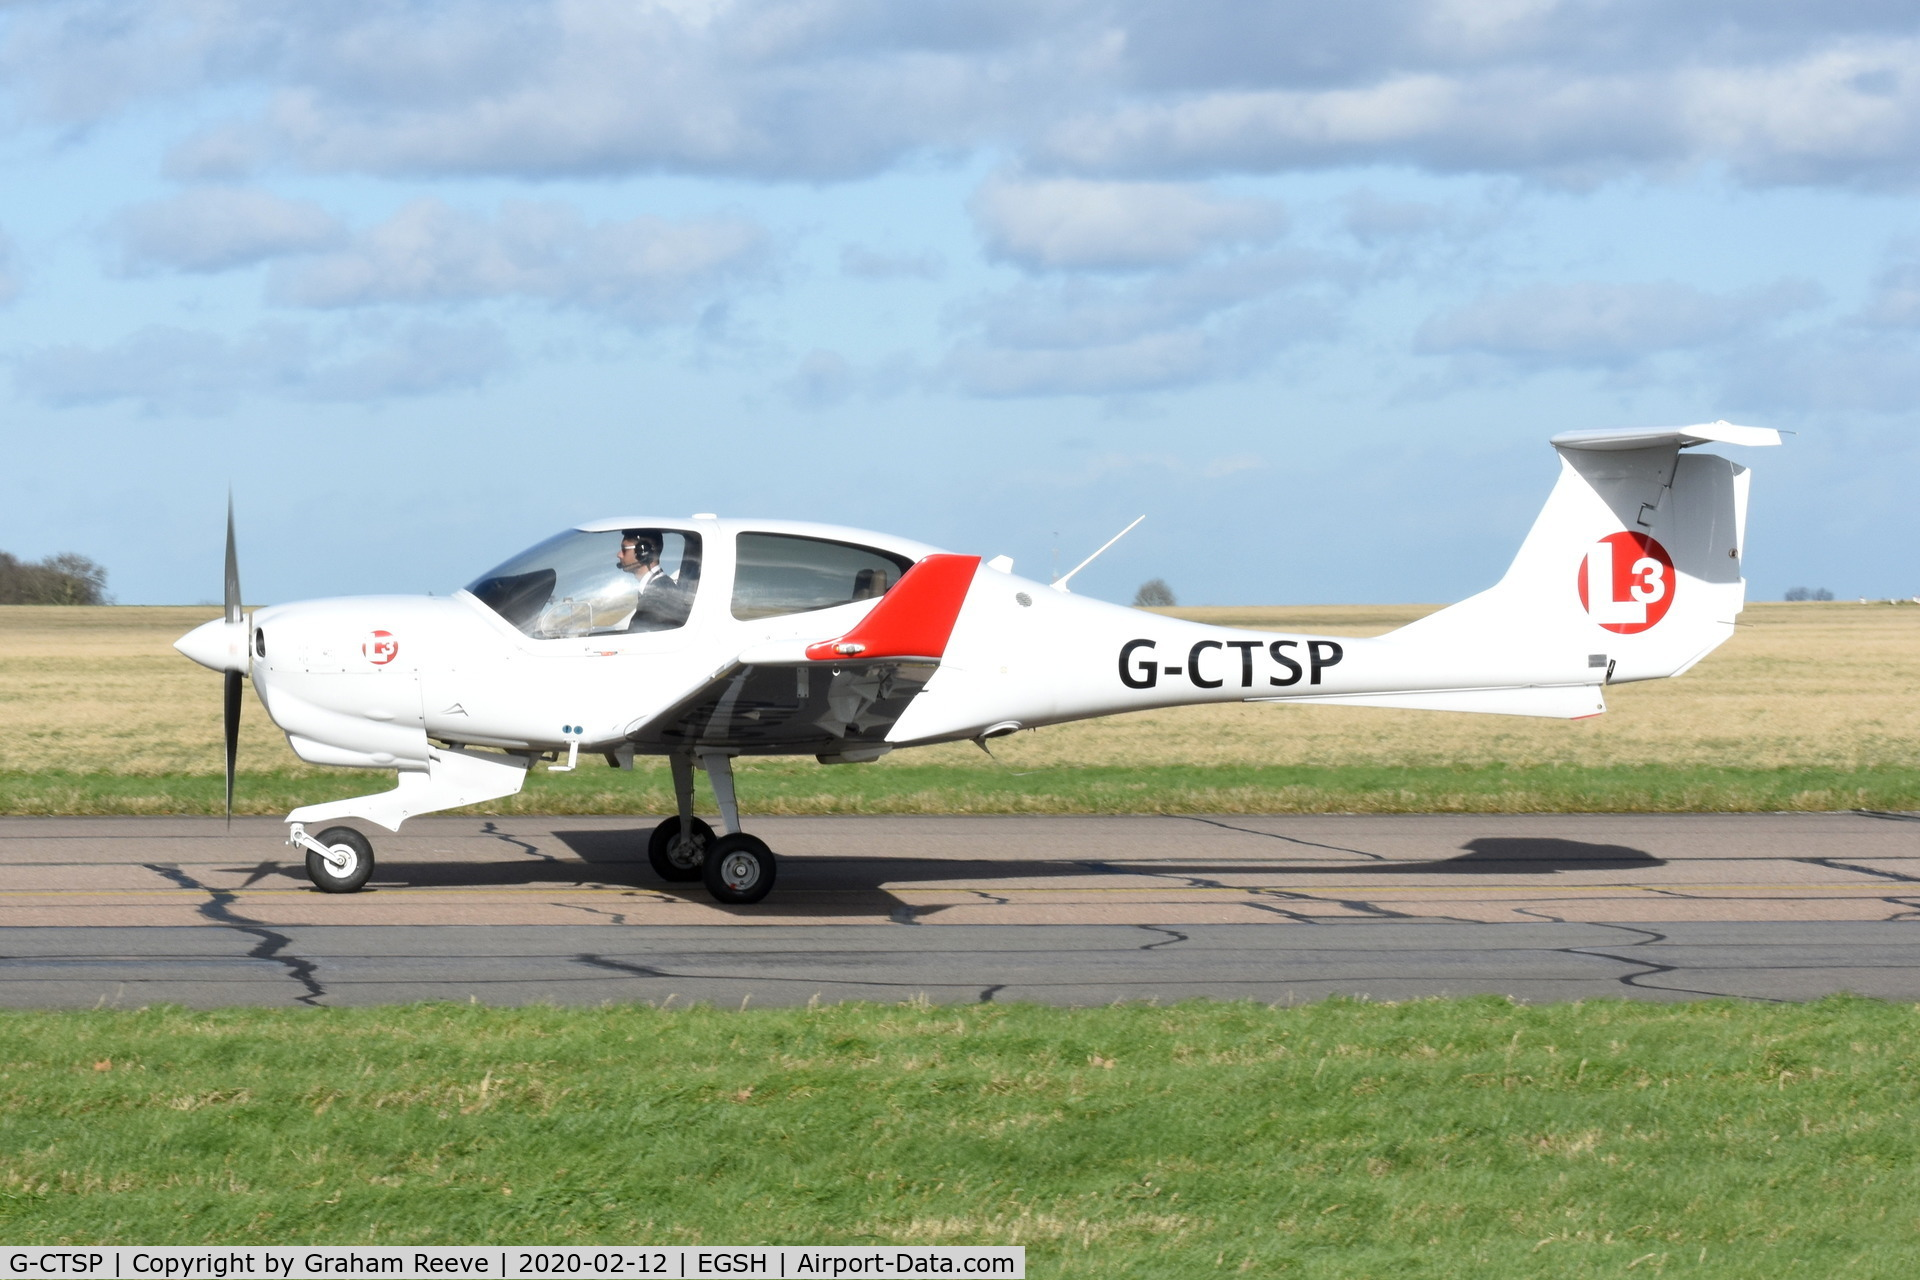 G-CTSP, 2016 Diamond DA-40NG Diamond Star C/N 40.N309, Just landed at Norwich.